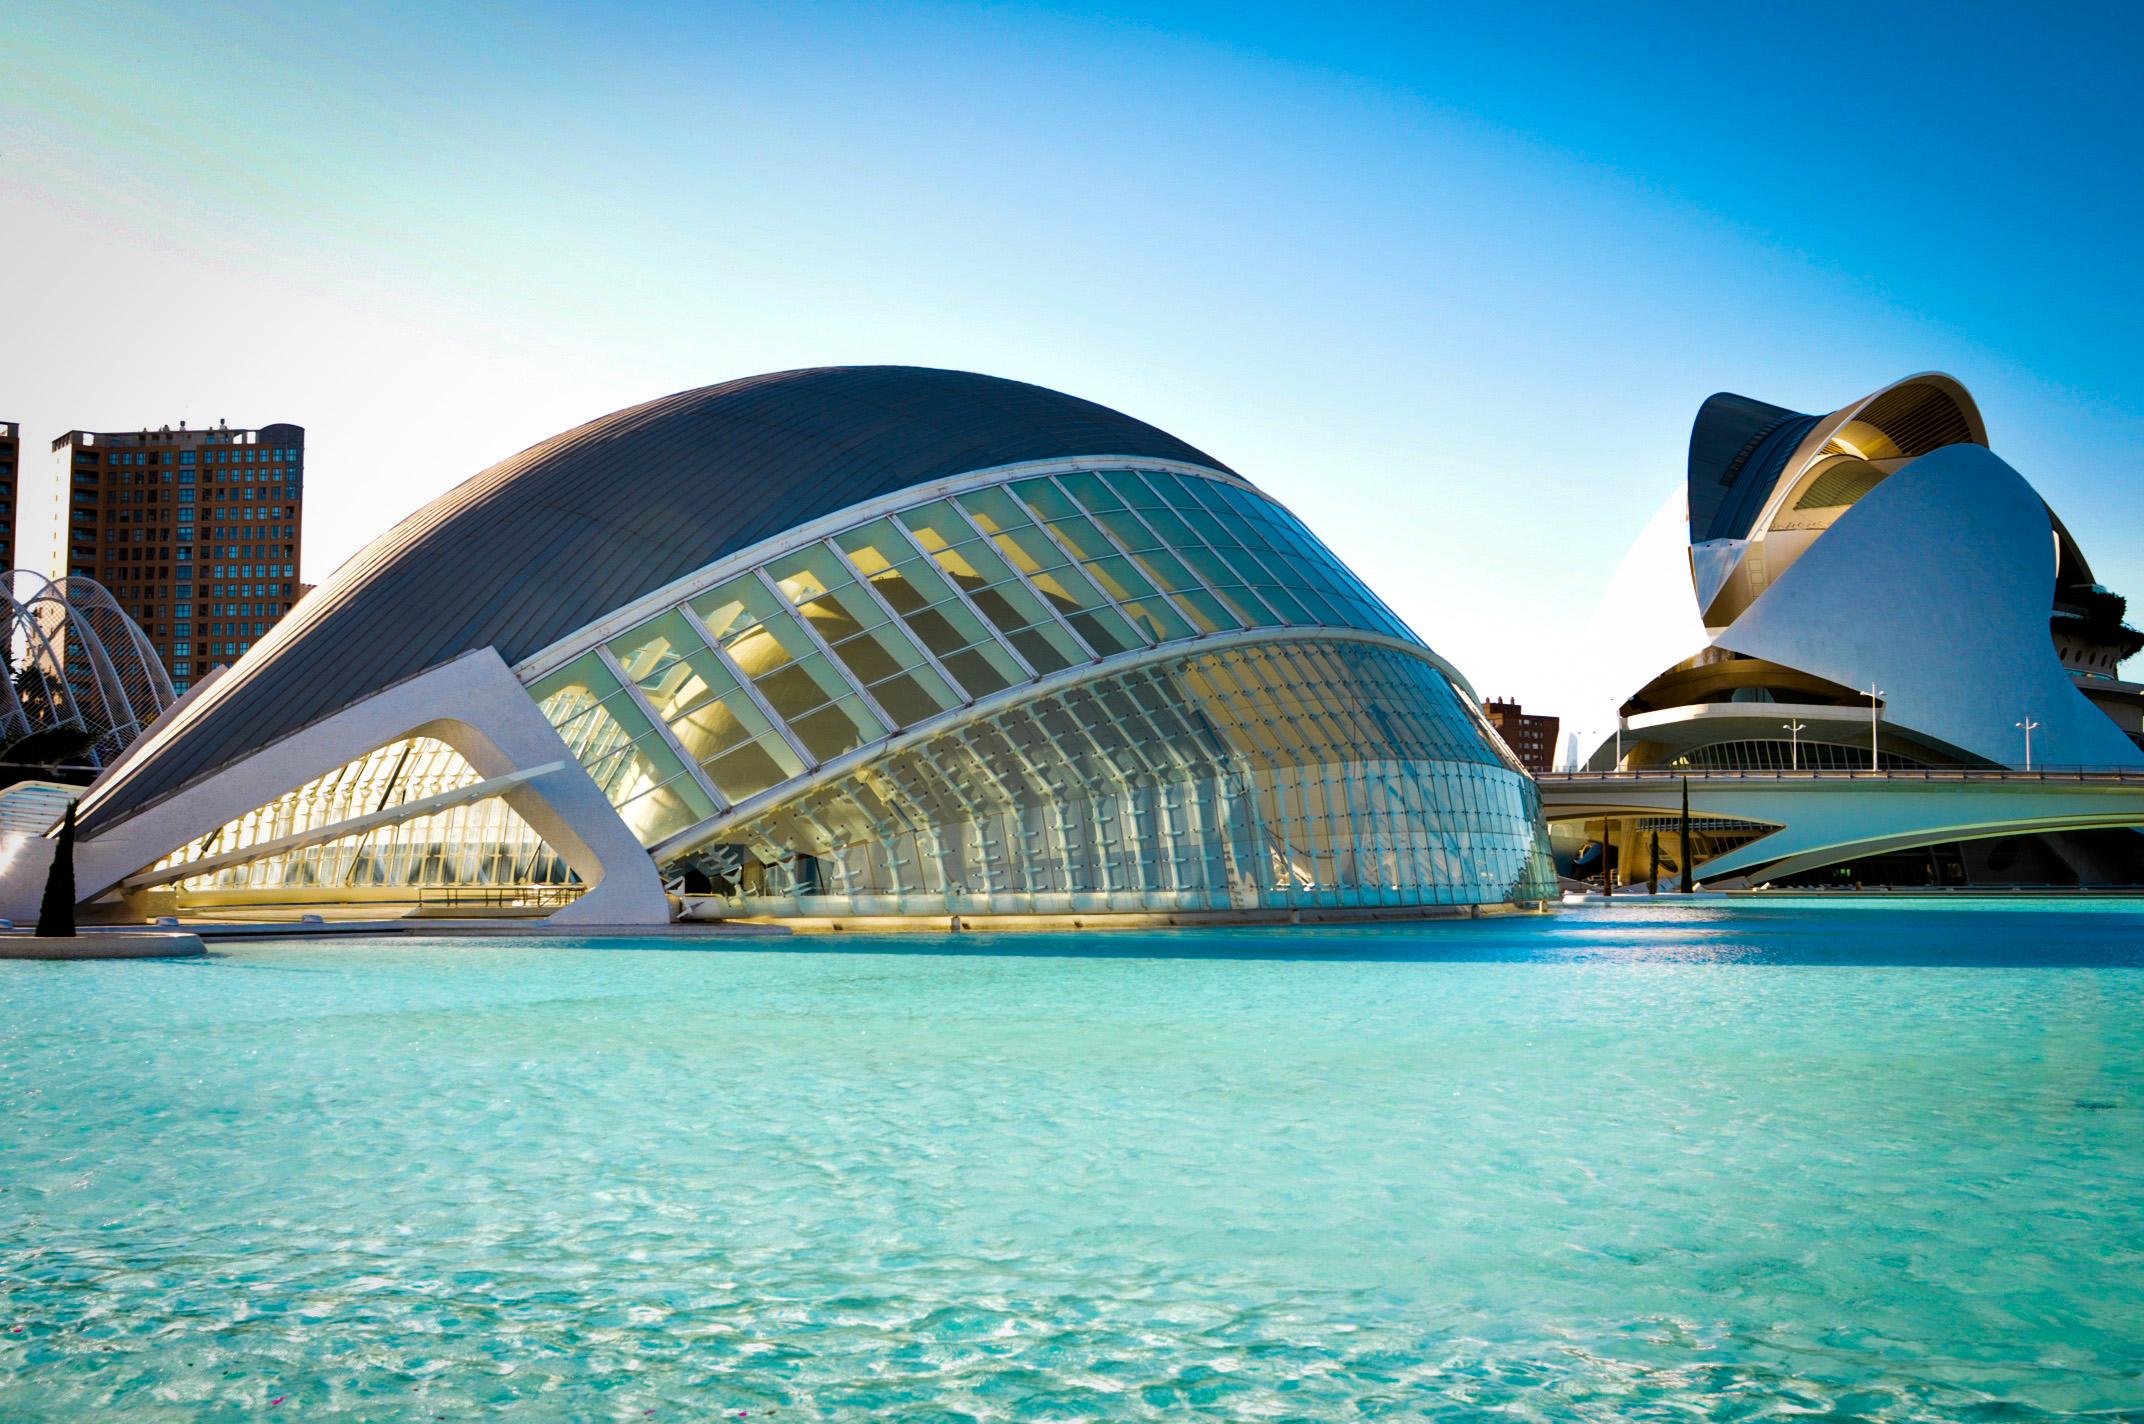 Valencia -  L'Hemisferic